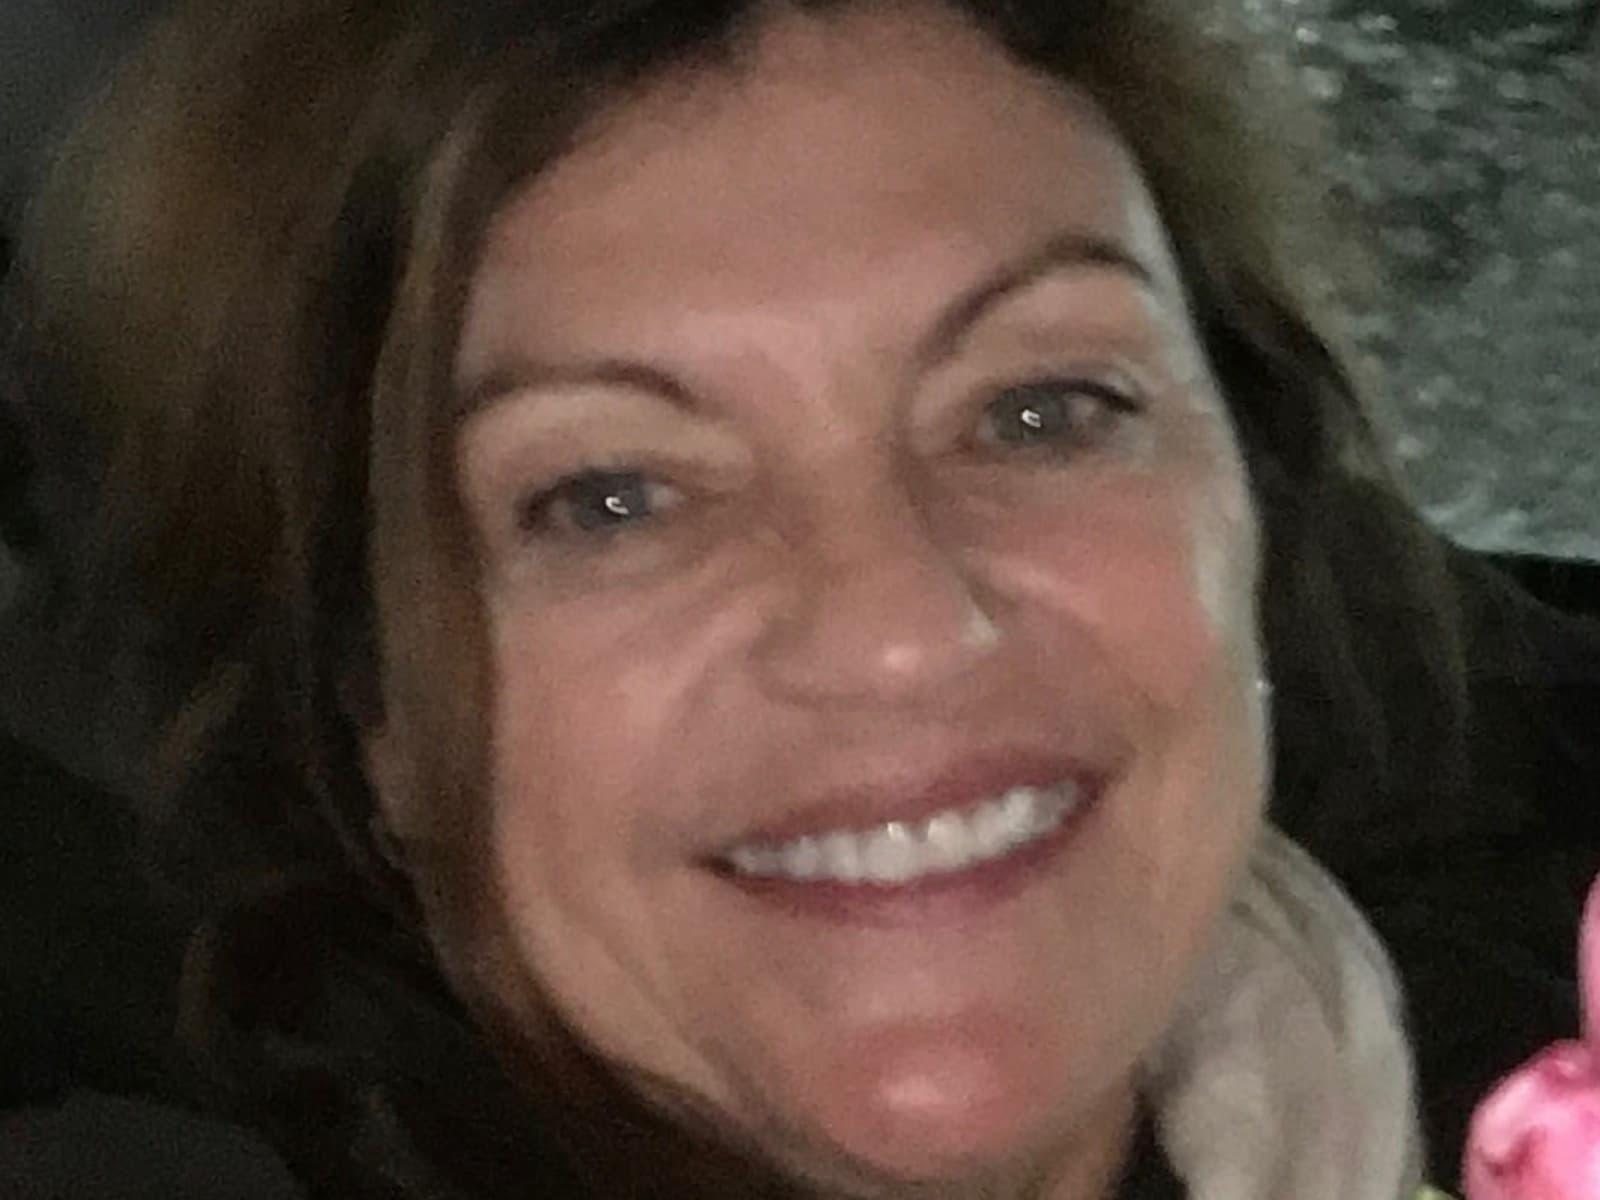 Rita from Stockholm, Sweden